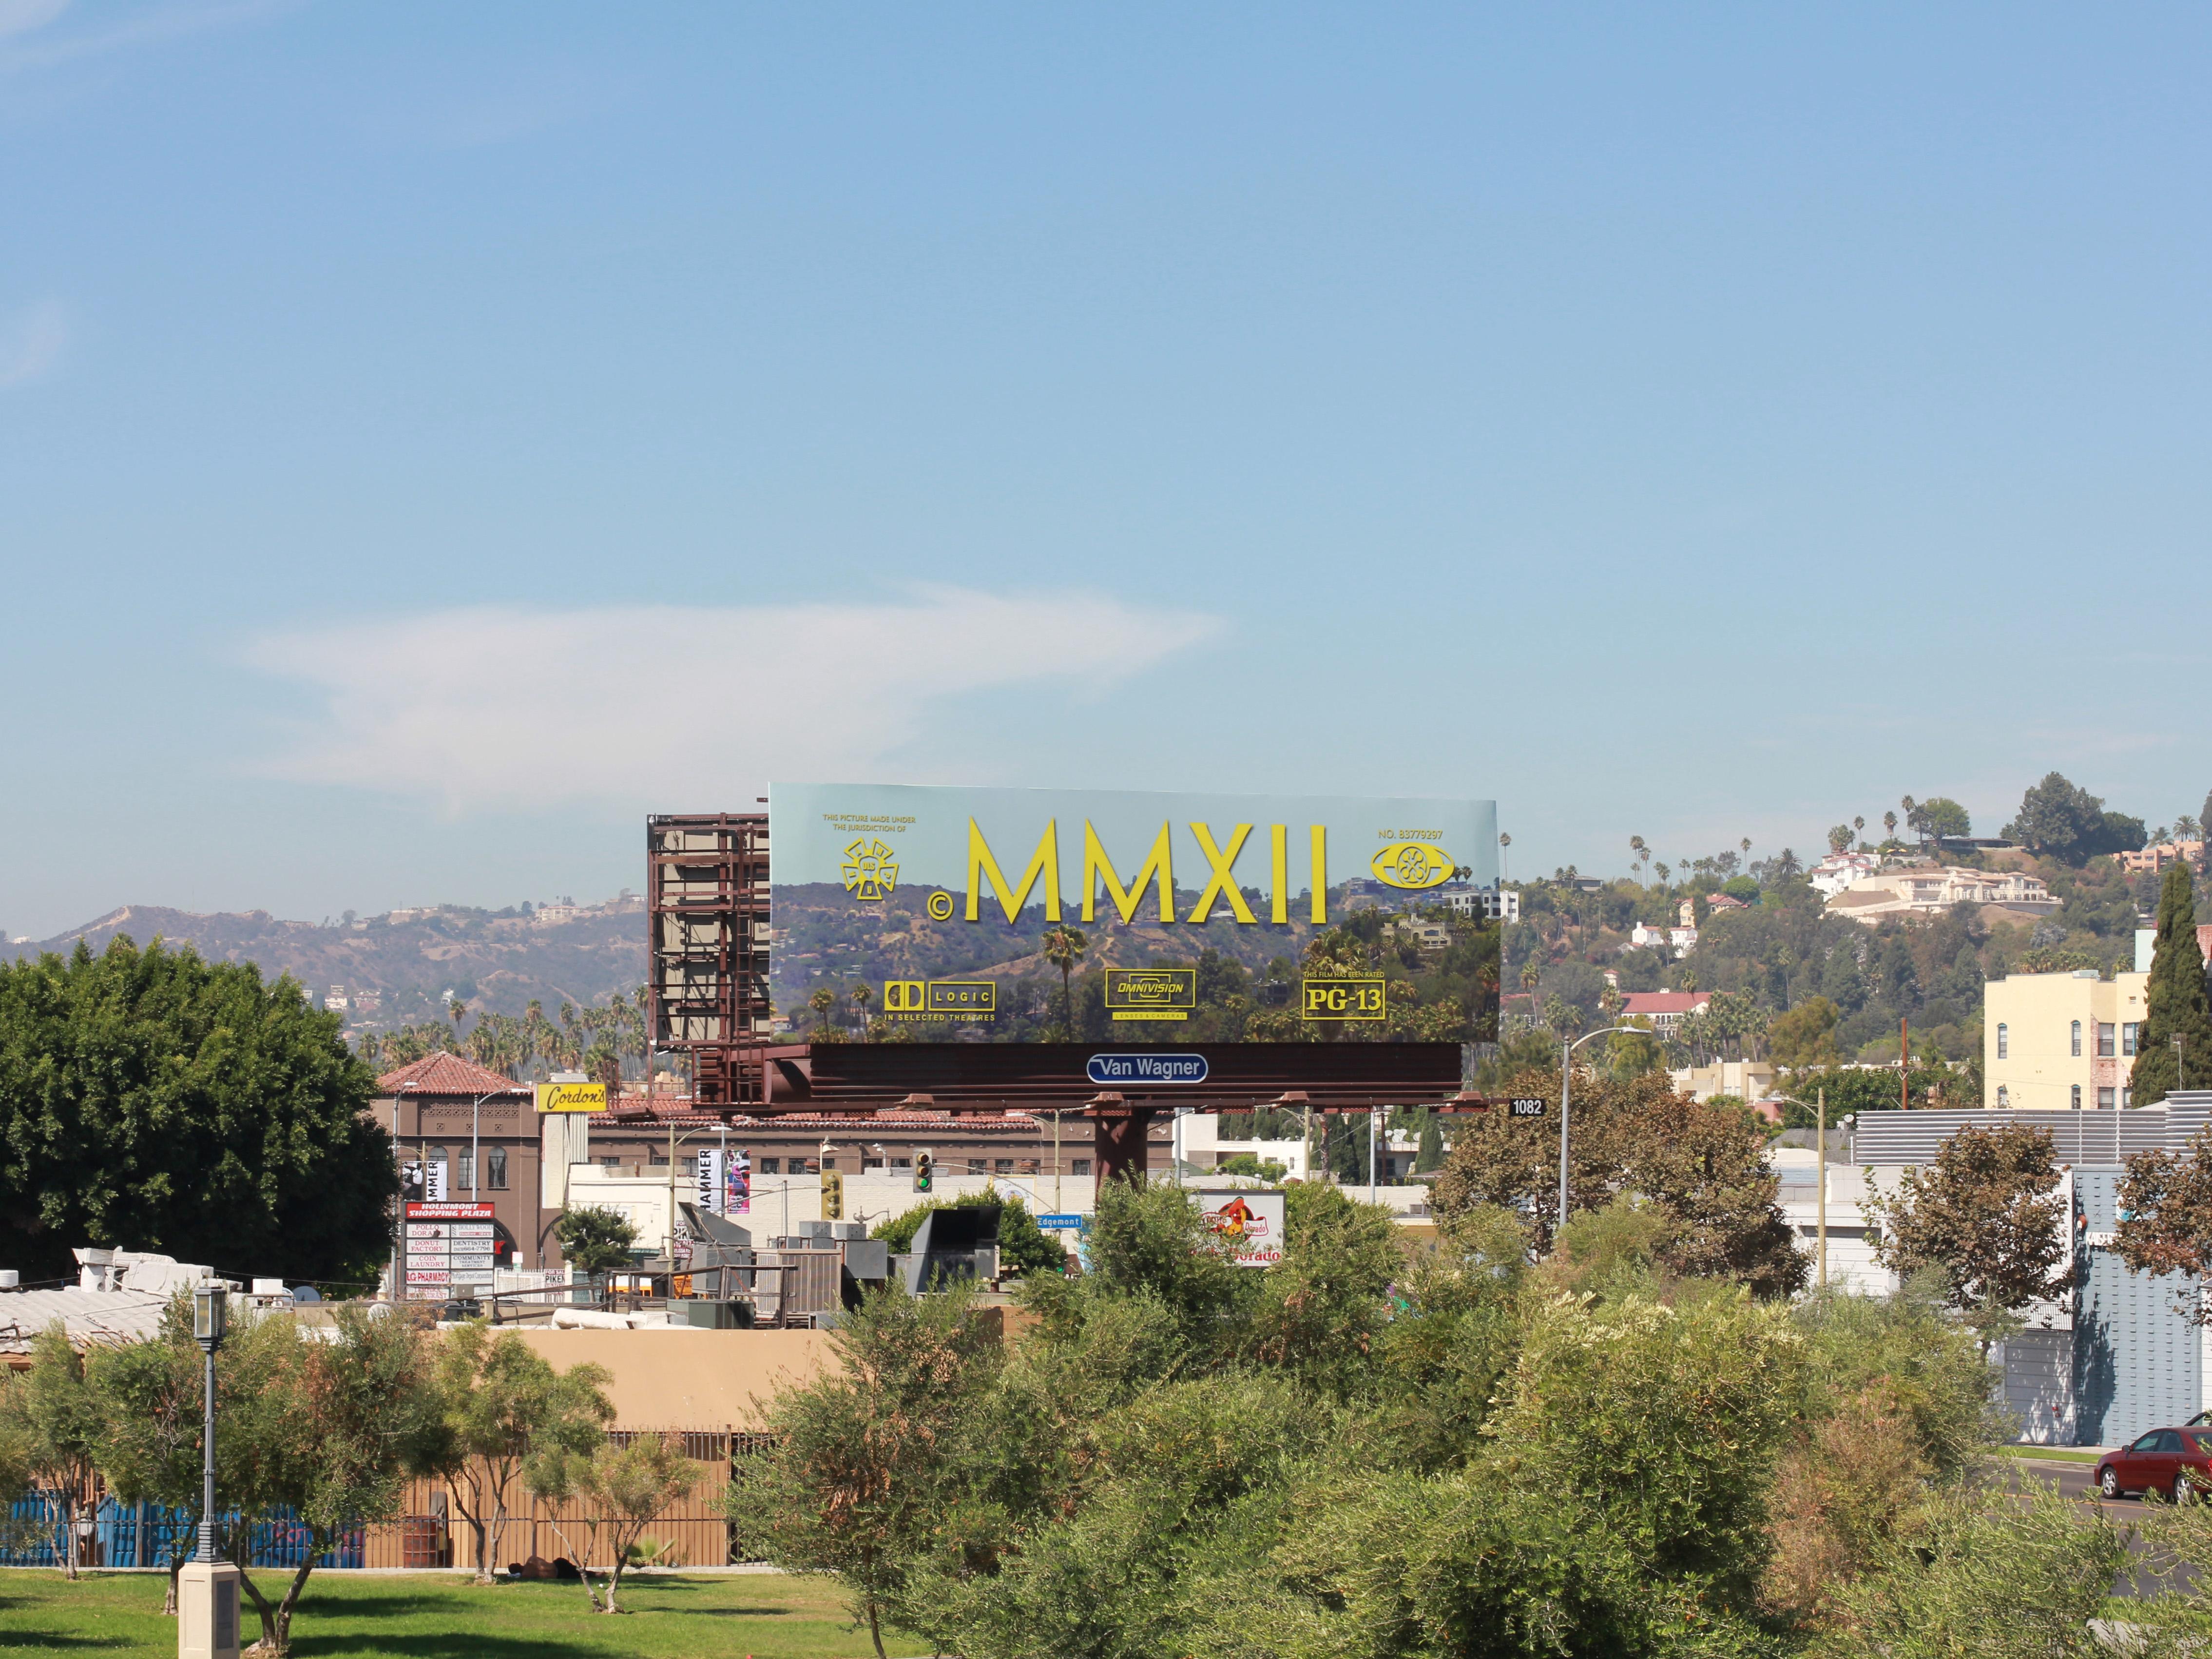 Cayetano Ferrer, End Credits on Hollywood, 2012, billboard on Hollywood Blvd